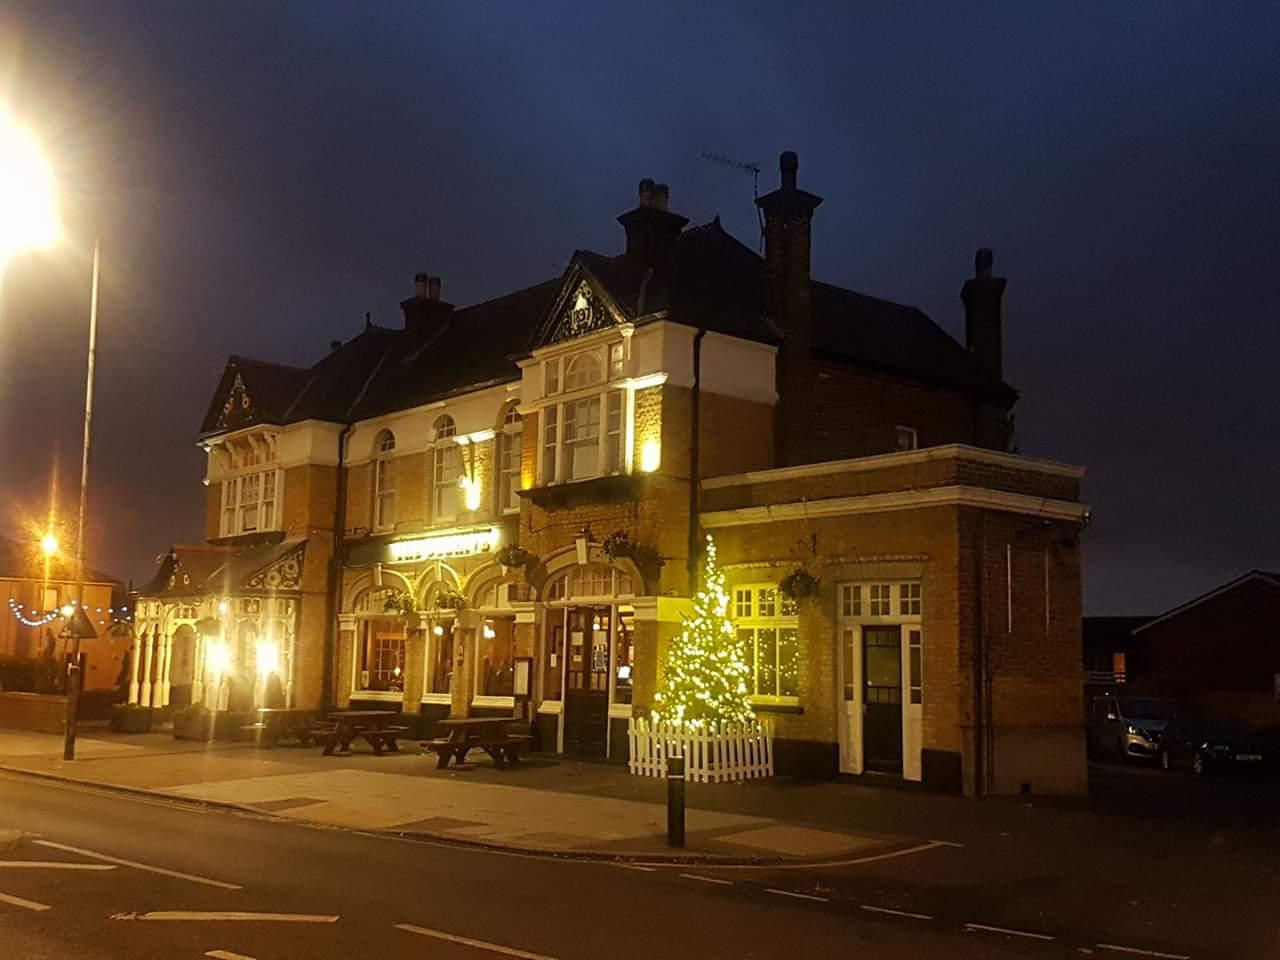 The beehive pub New Eltham